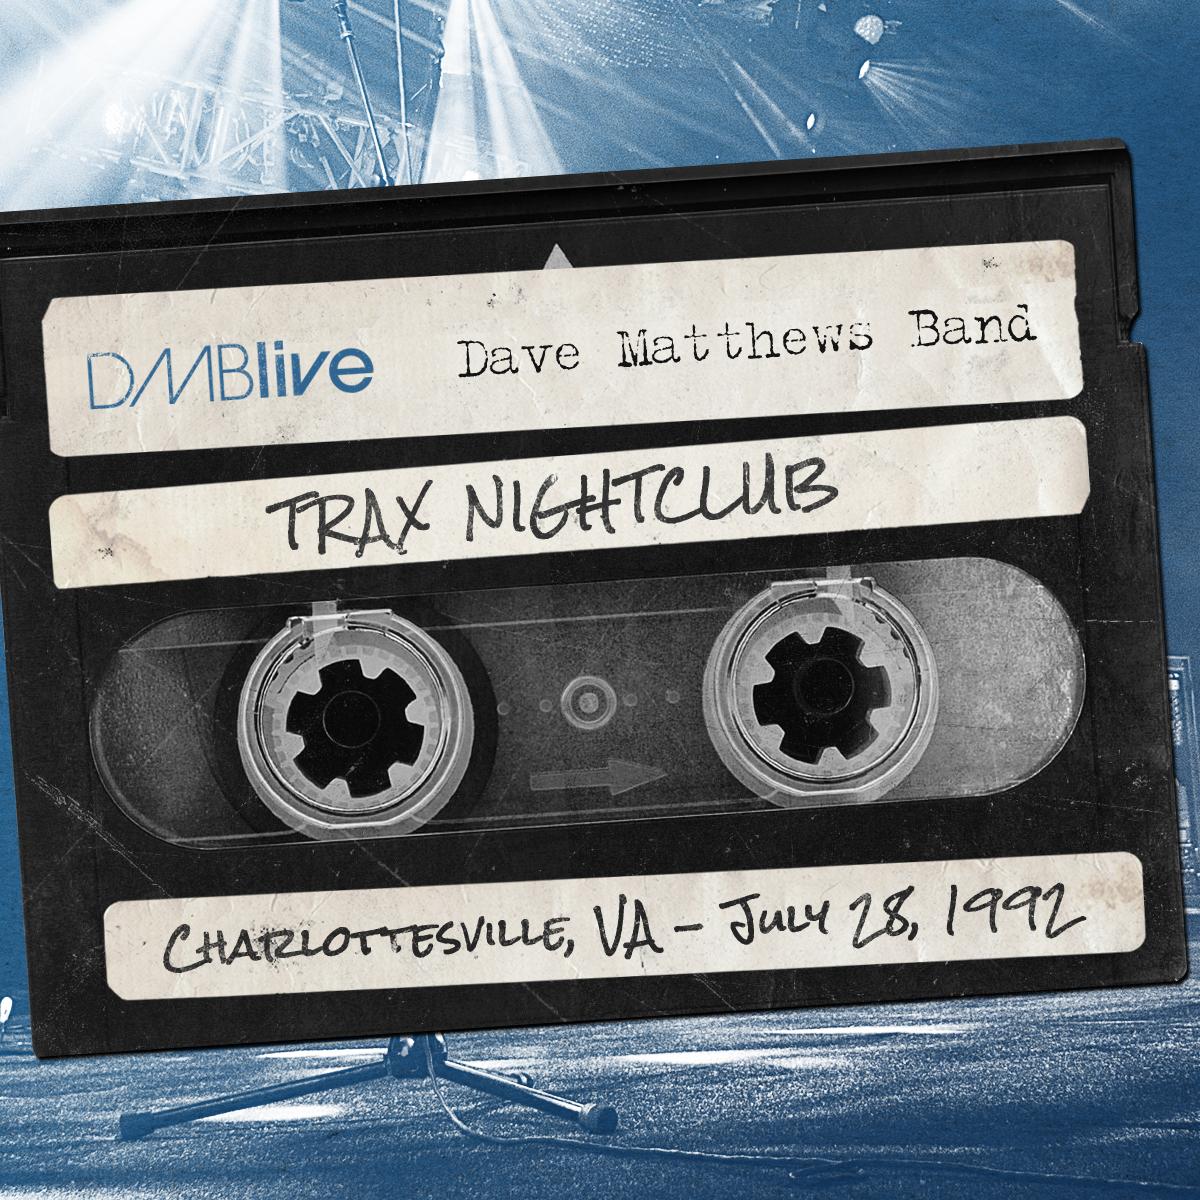 DMBLive Trax Nightclub, Charlottesville, VA 7/28/1992